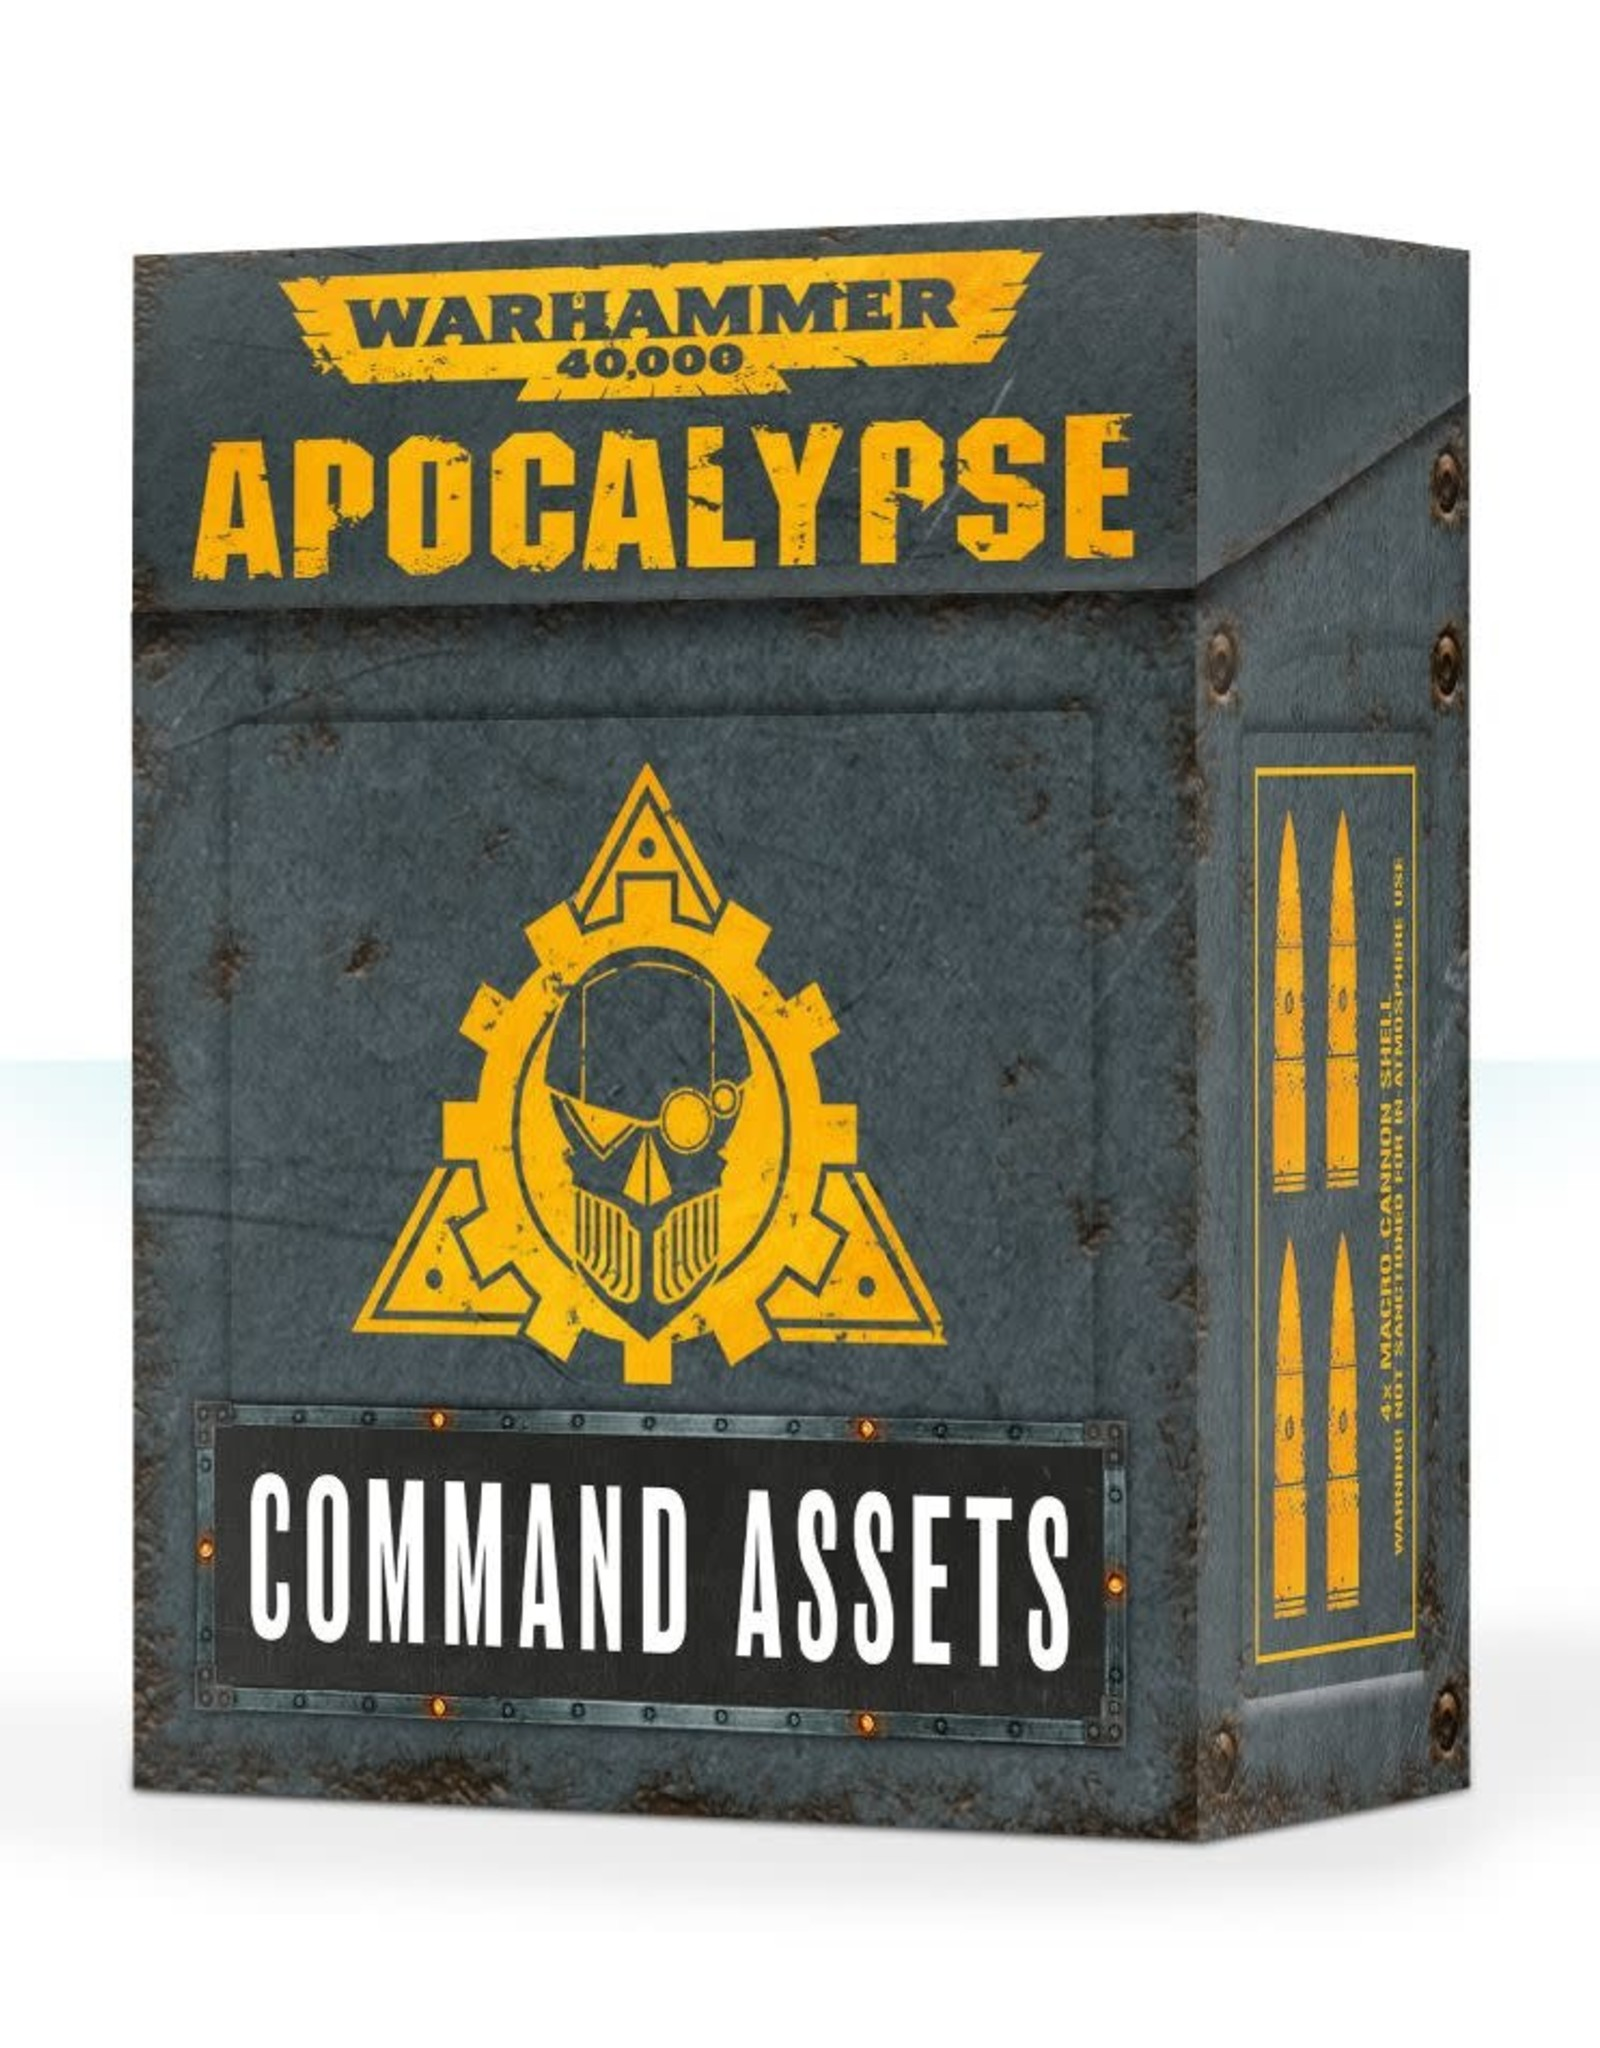 Warhammer 40K Apocalypse Command Assets